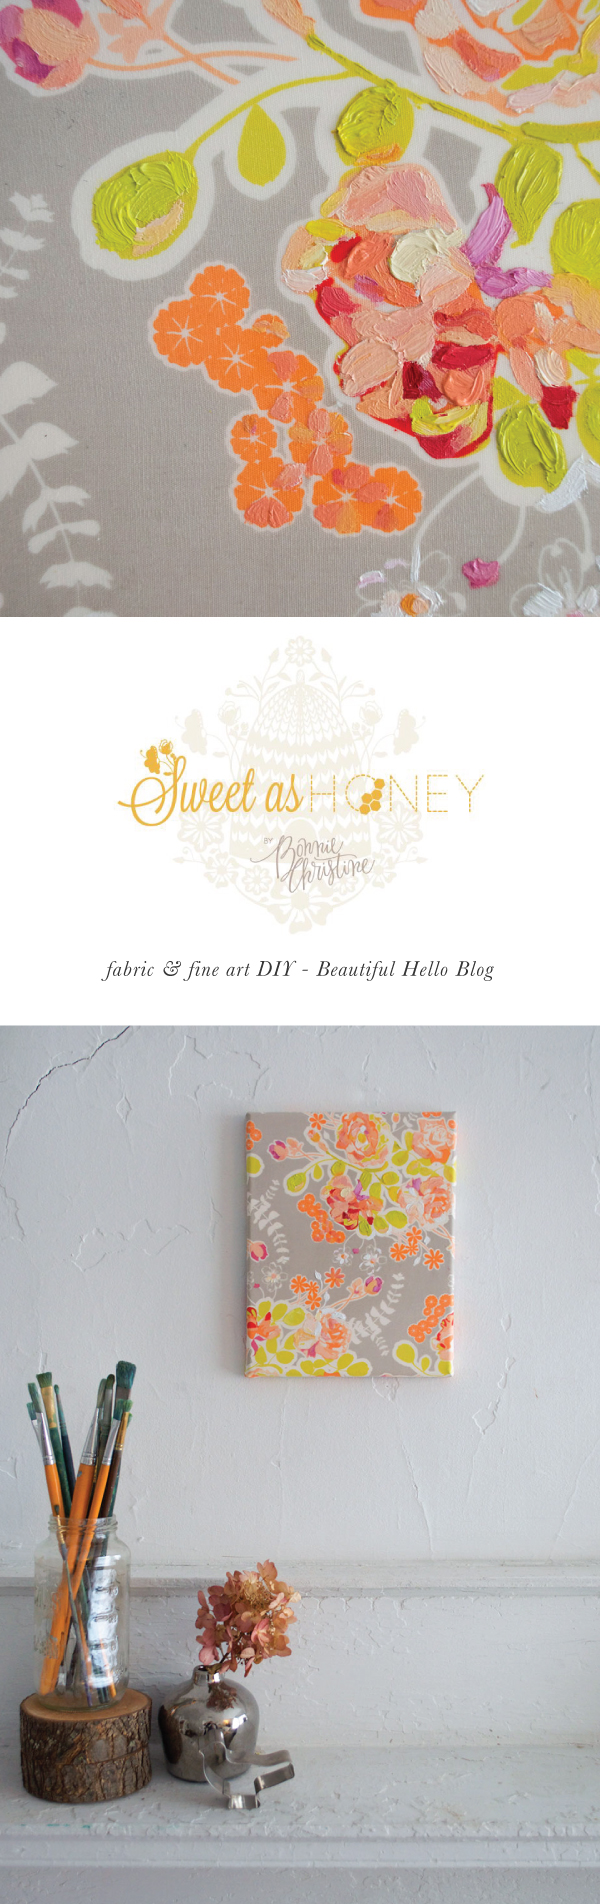 Fabric & Fine Art DIY: Sweet As Honey Design on Beautiful Hello Blog